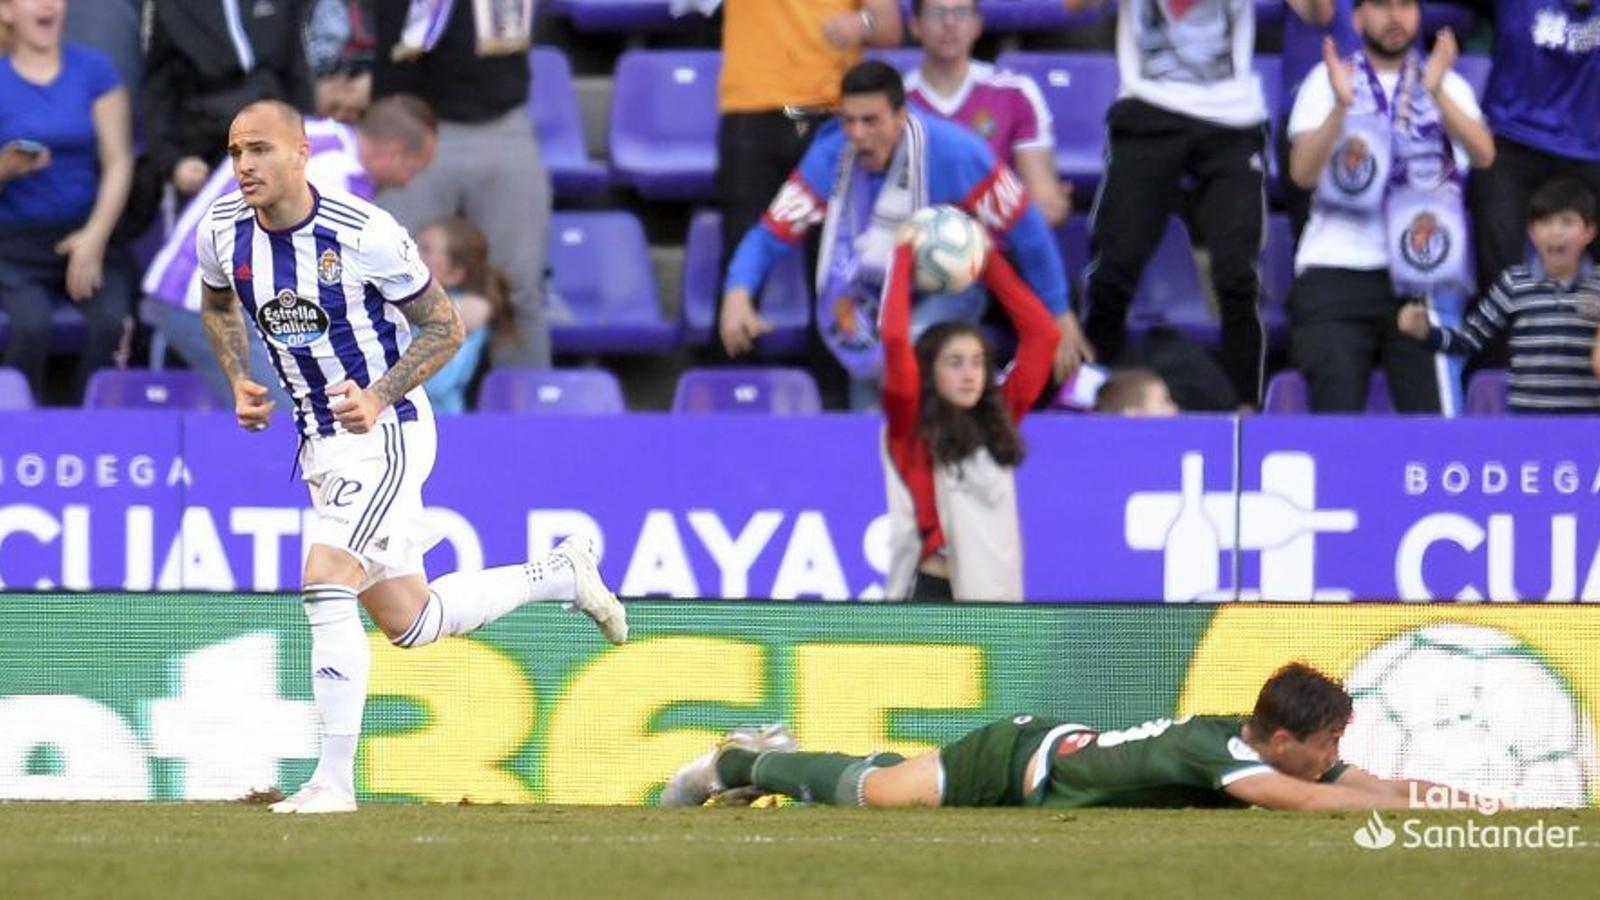 Bernardo, estès sobre la gespa del José Zorrilla mentre Sandro celebra el primer gol del Valladolid